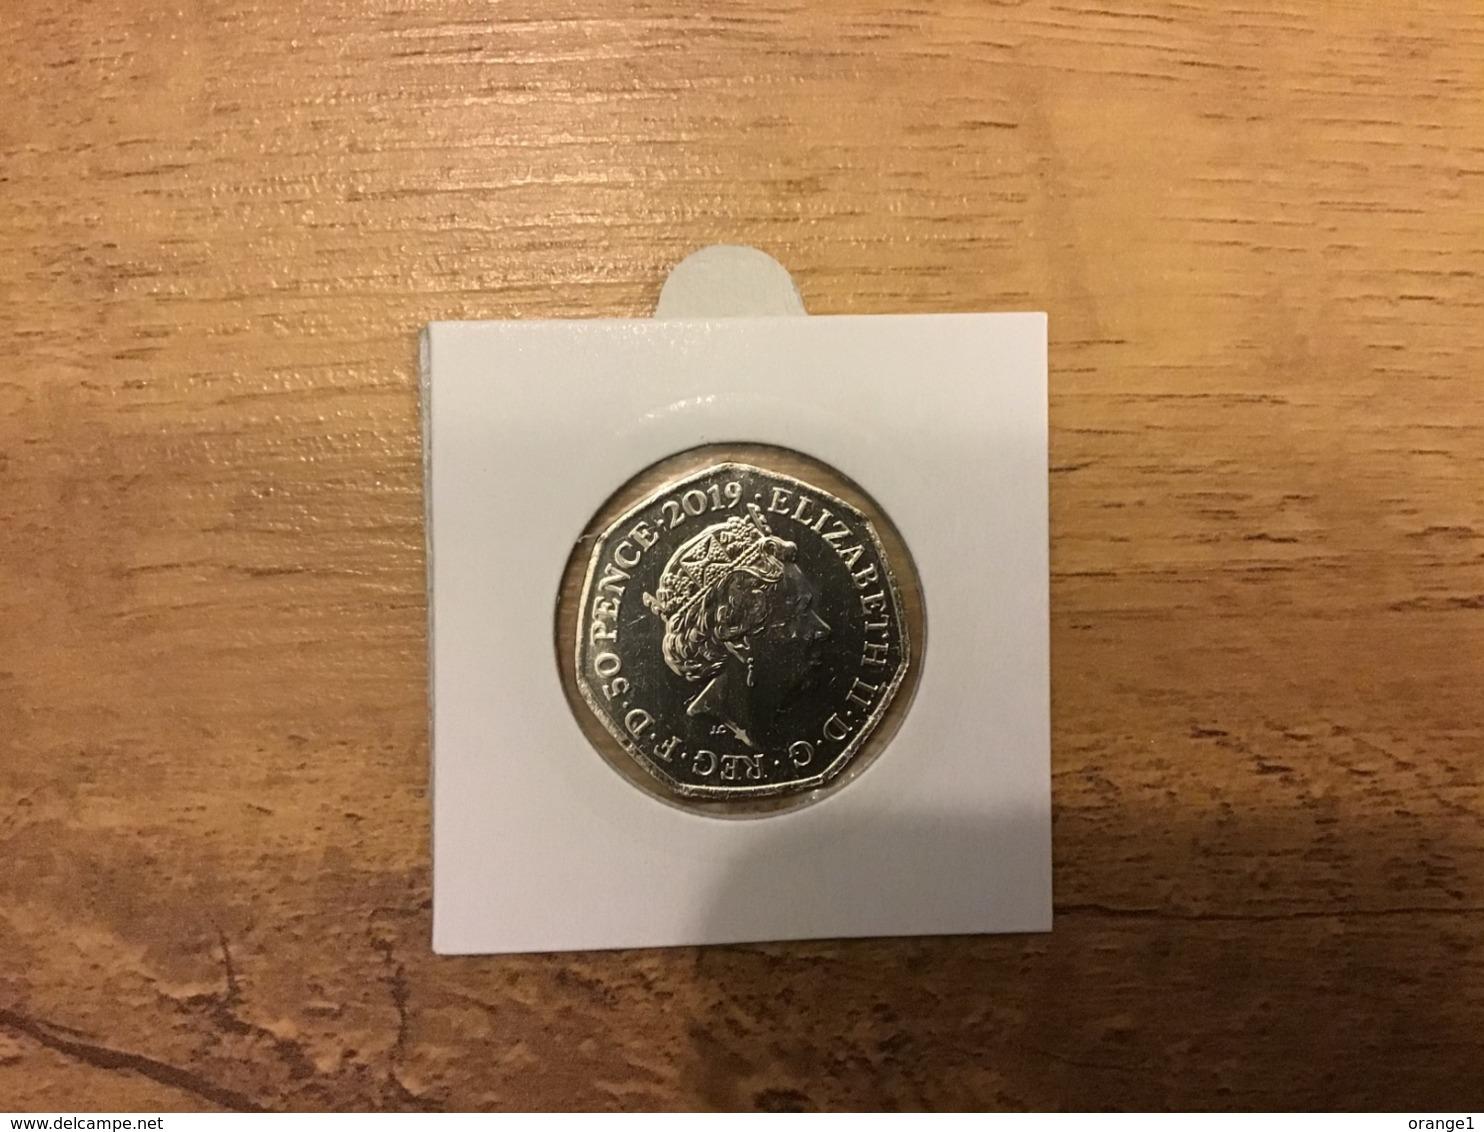 Great Britain 2019 Paddington Bear At St Paul's Cathedral 50p Uncirculated Coin - 50 Pence